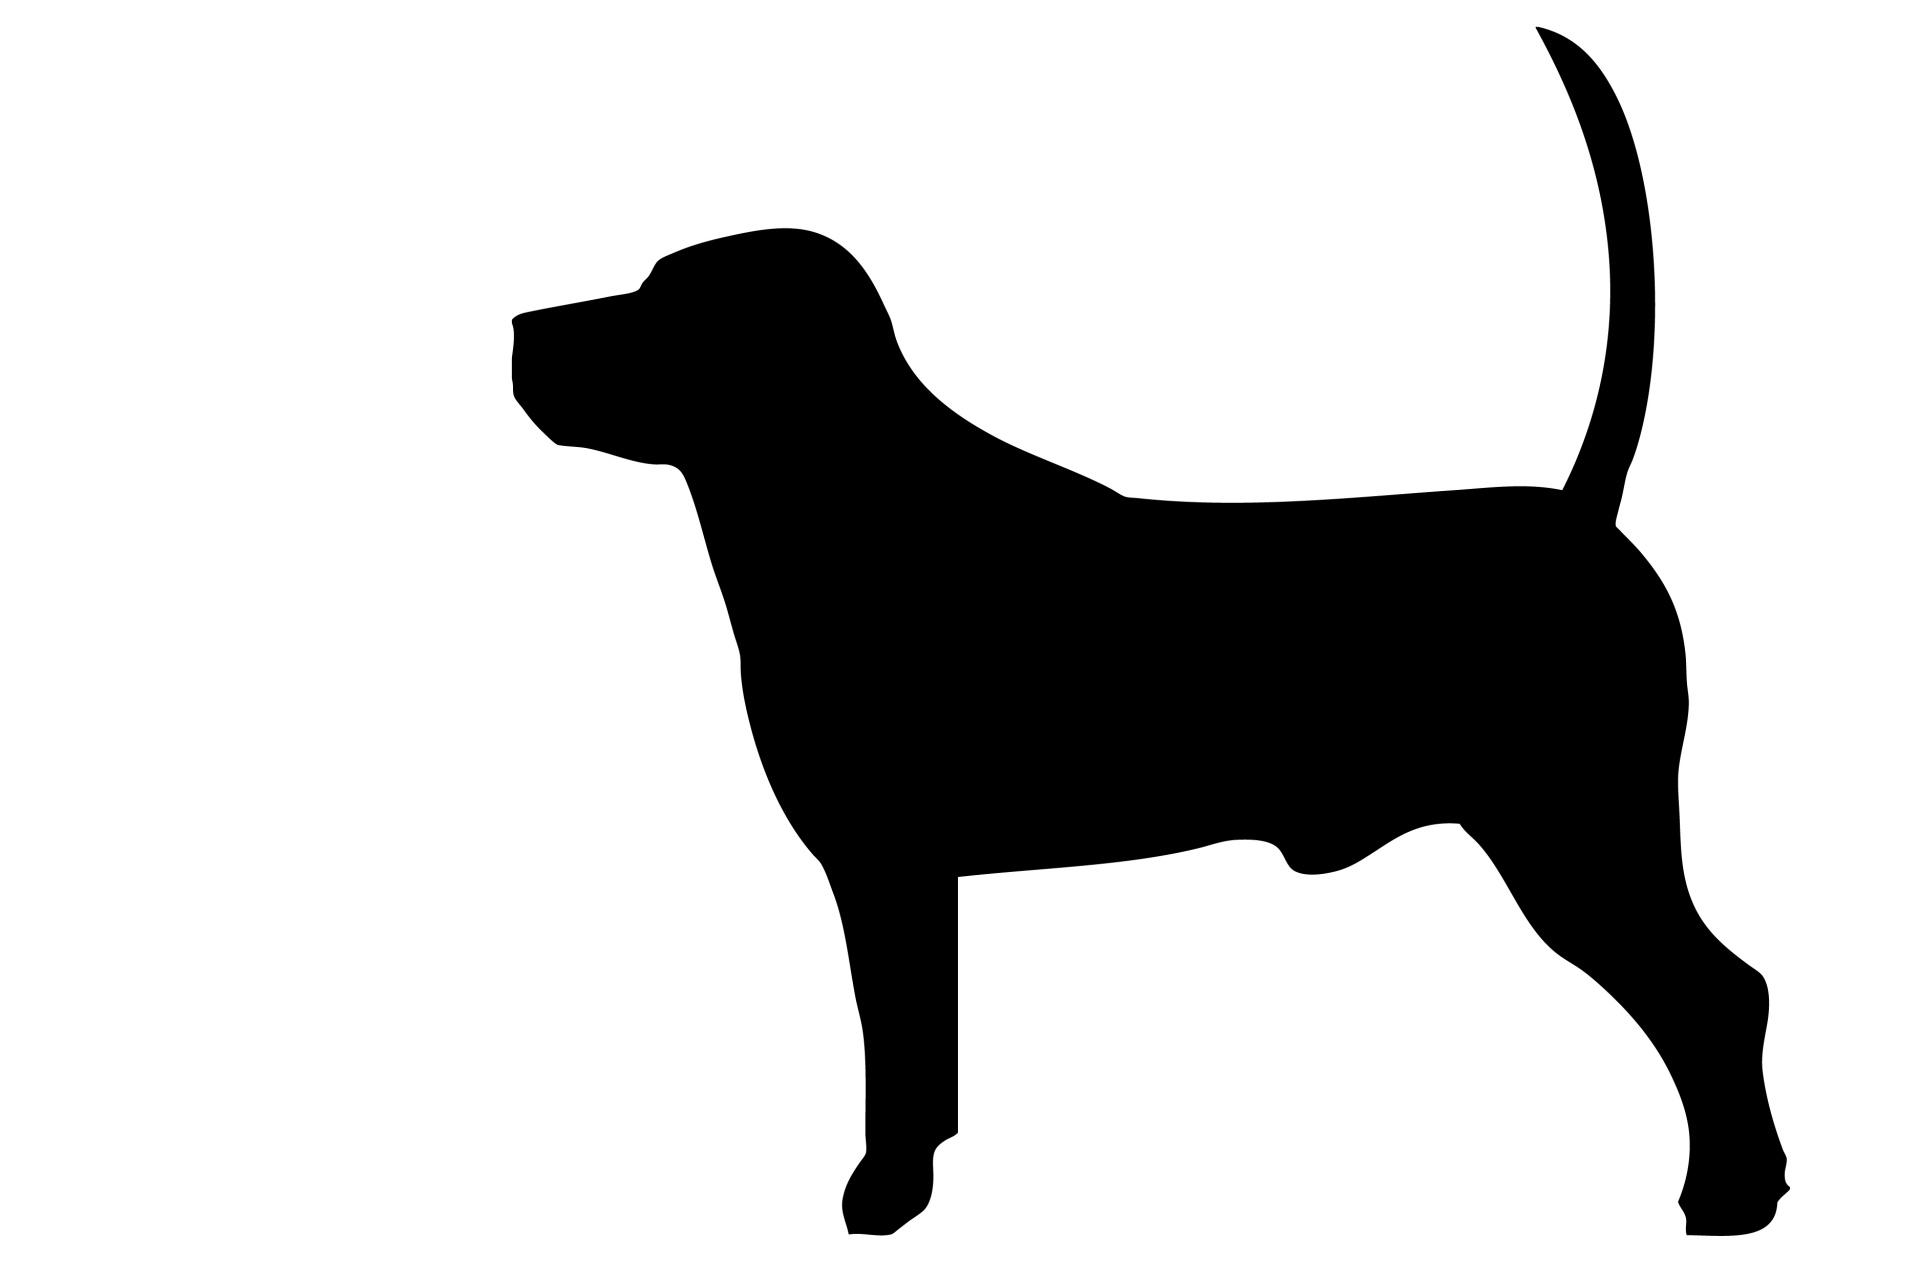 1920x1280 Dog Black Silhouette Free Stock Photo